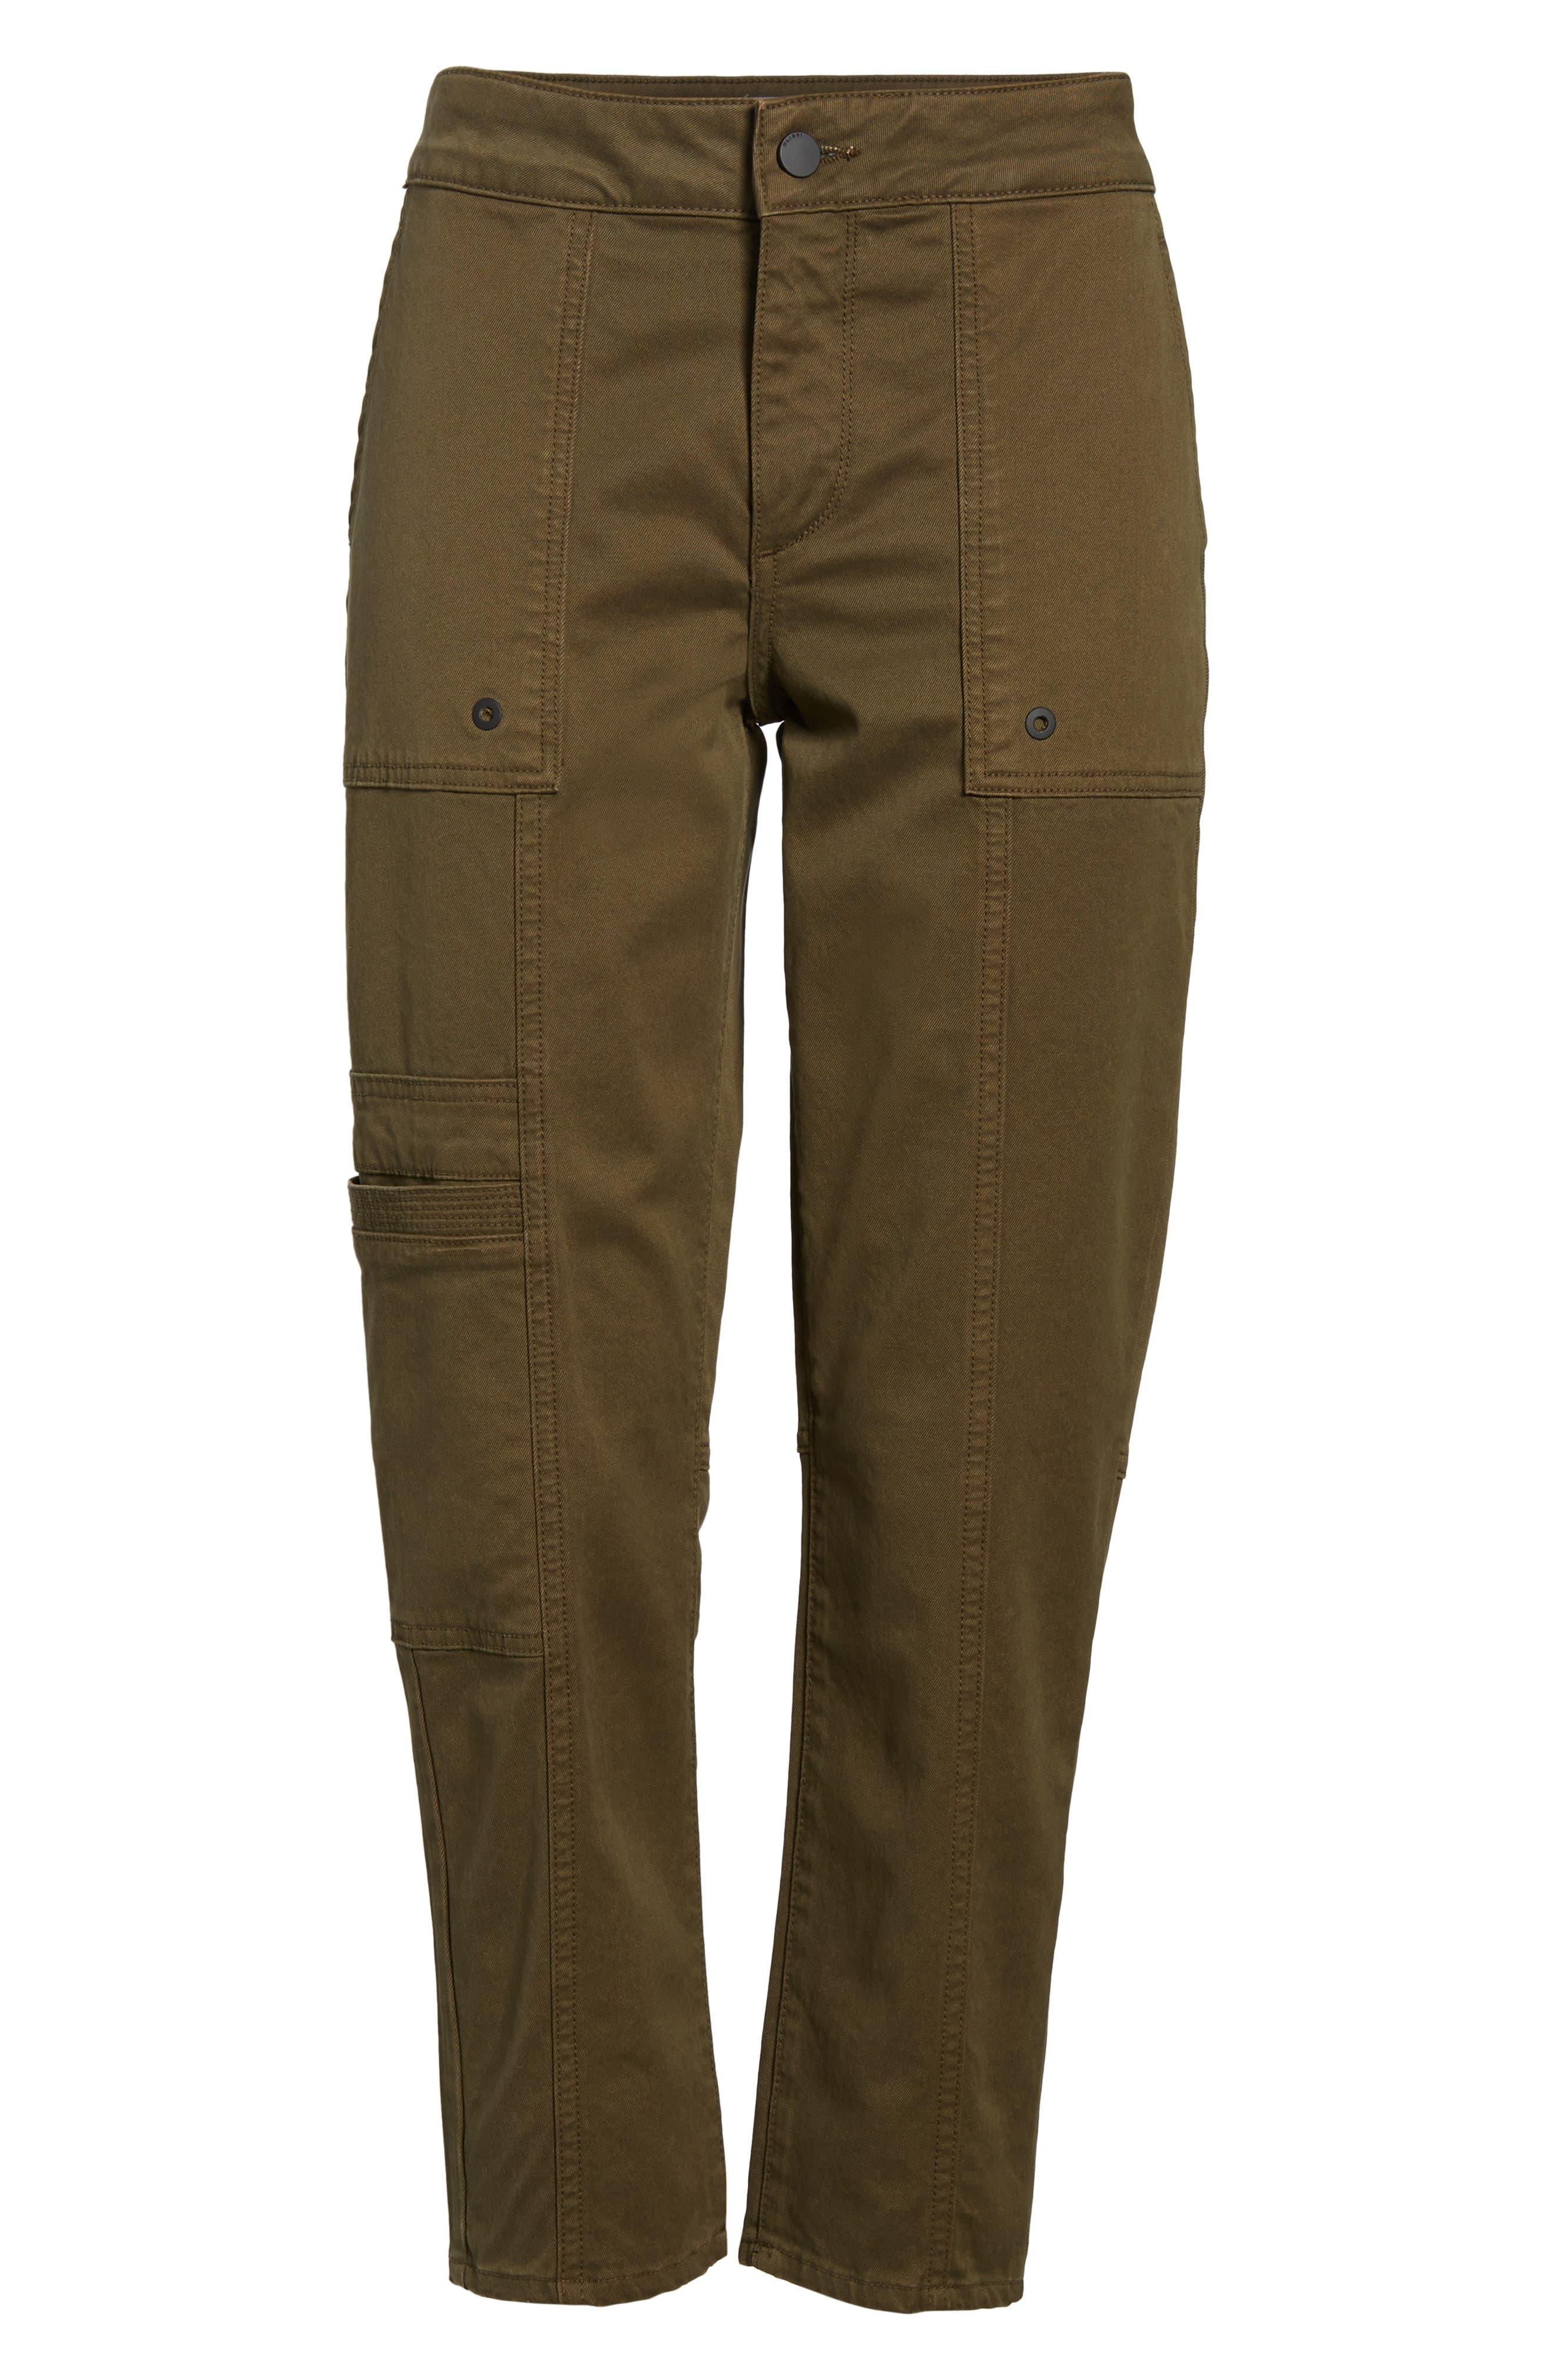 Elliot Slouchy Slim Cargo Pants,                             Alternate thumbnail 7, color,                             Driftless